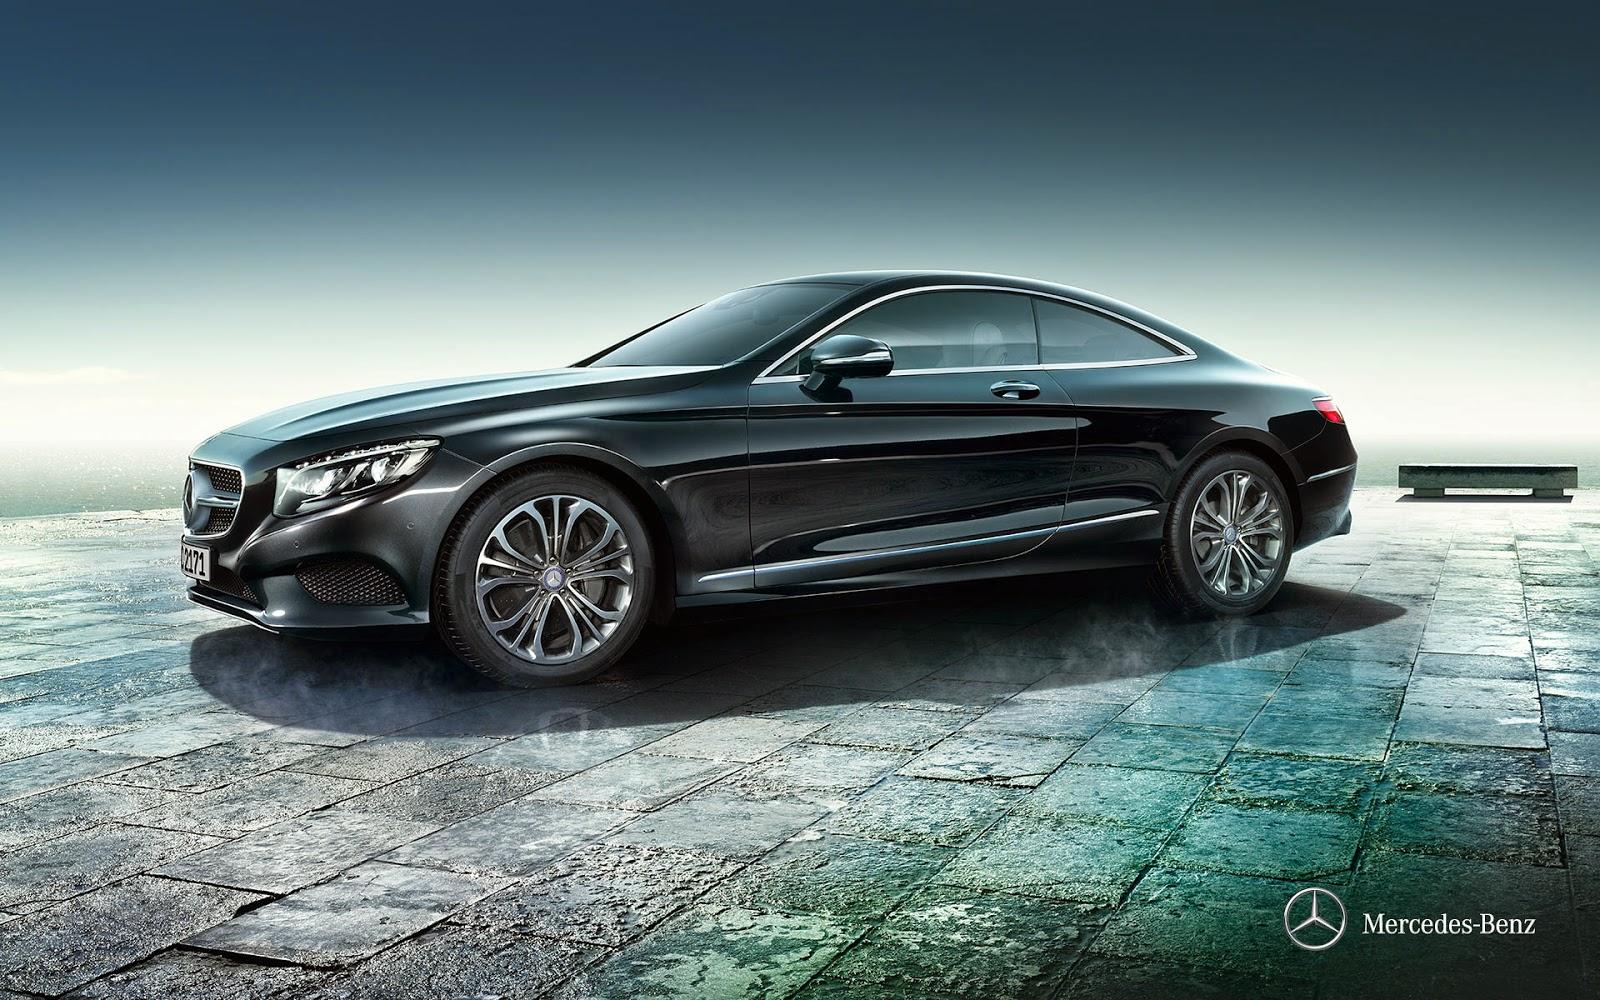 41+ Mercedes Benz HD Wallpapers on WallpaperSafari